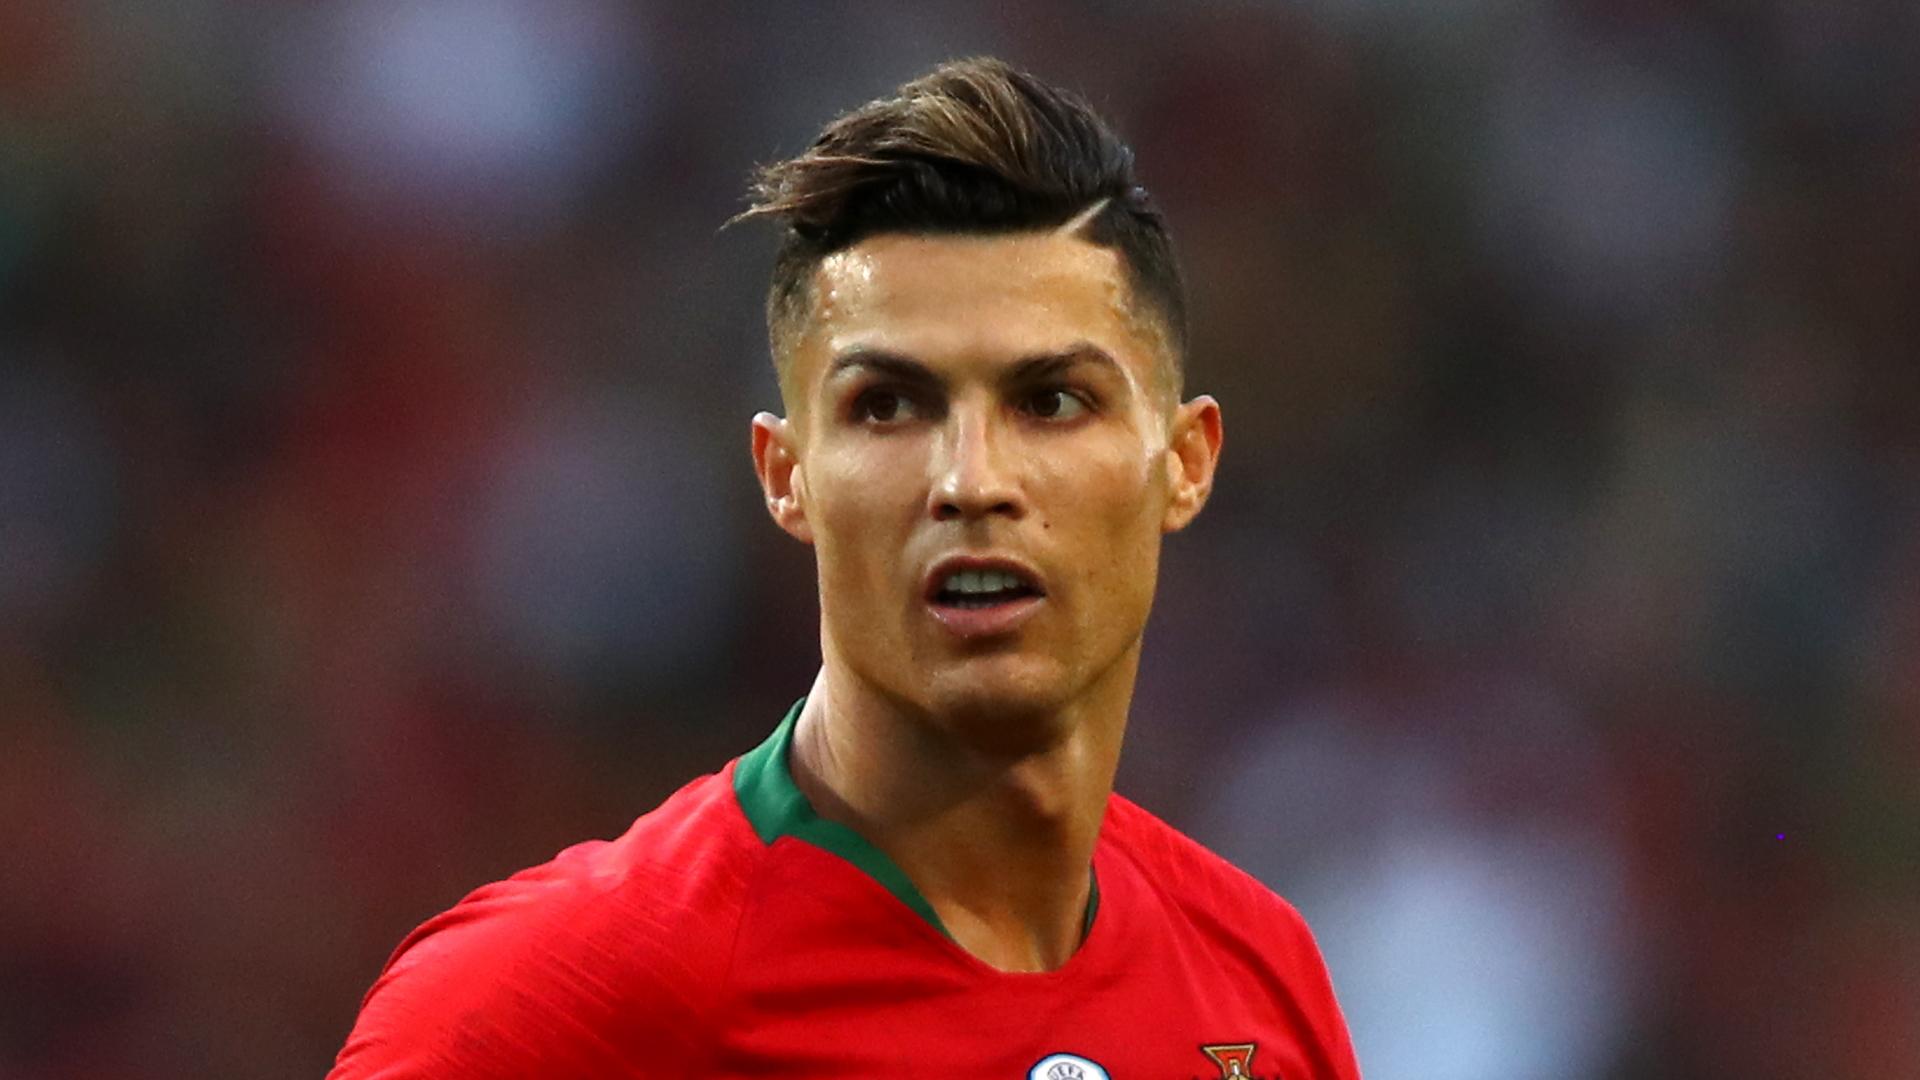 Cristiano Ronaldo répond sur le terrain - Euro 2020